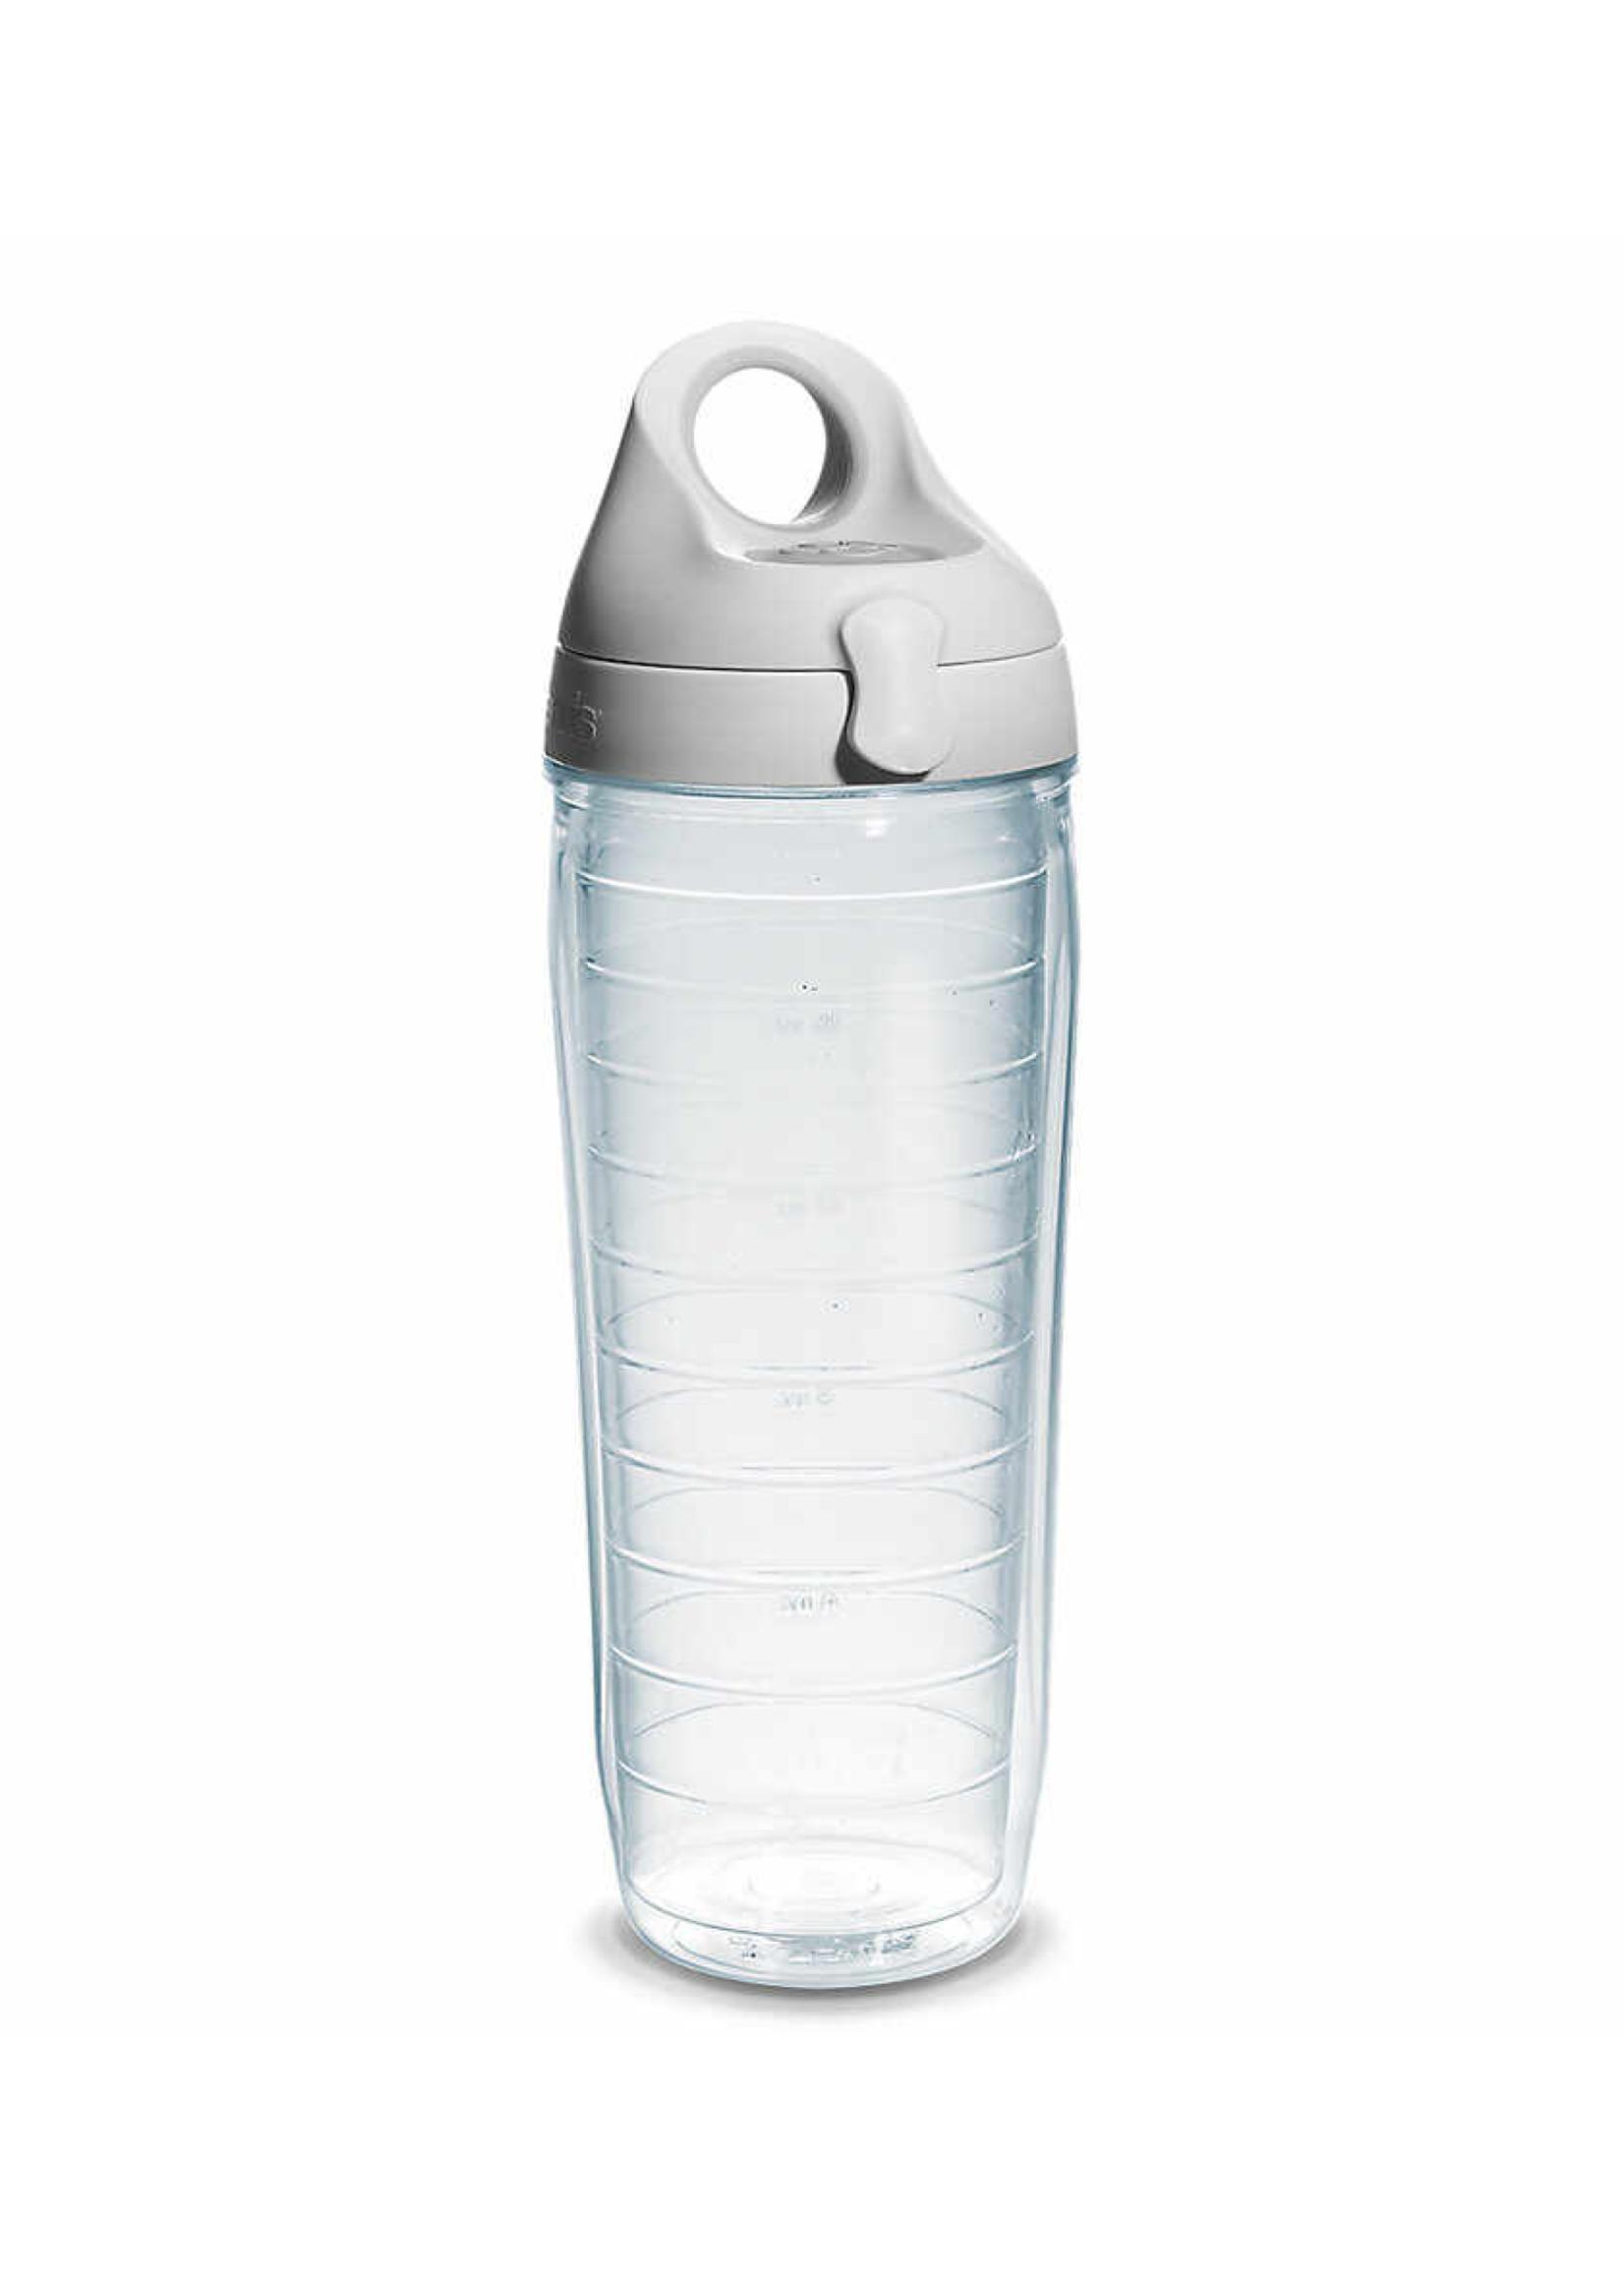 Tervis Tumblers Water Bottle Lids